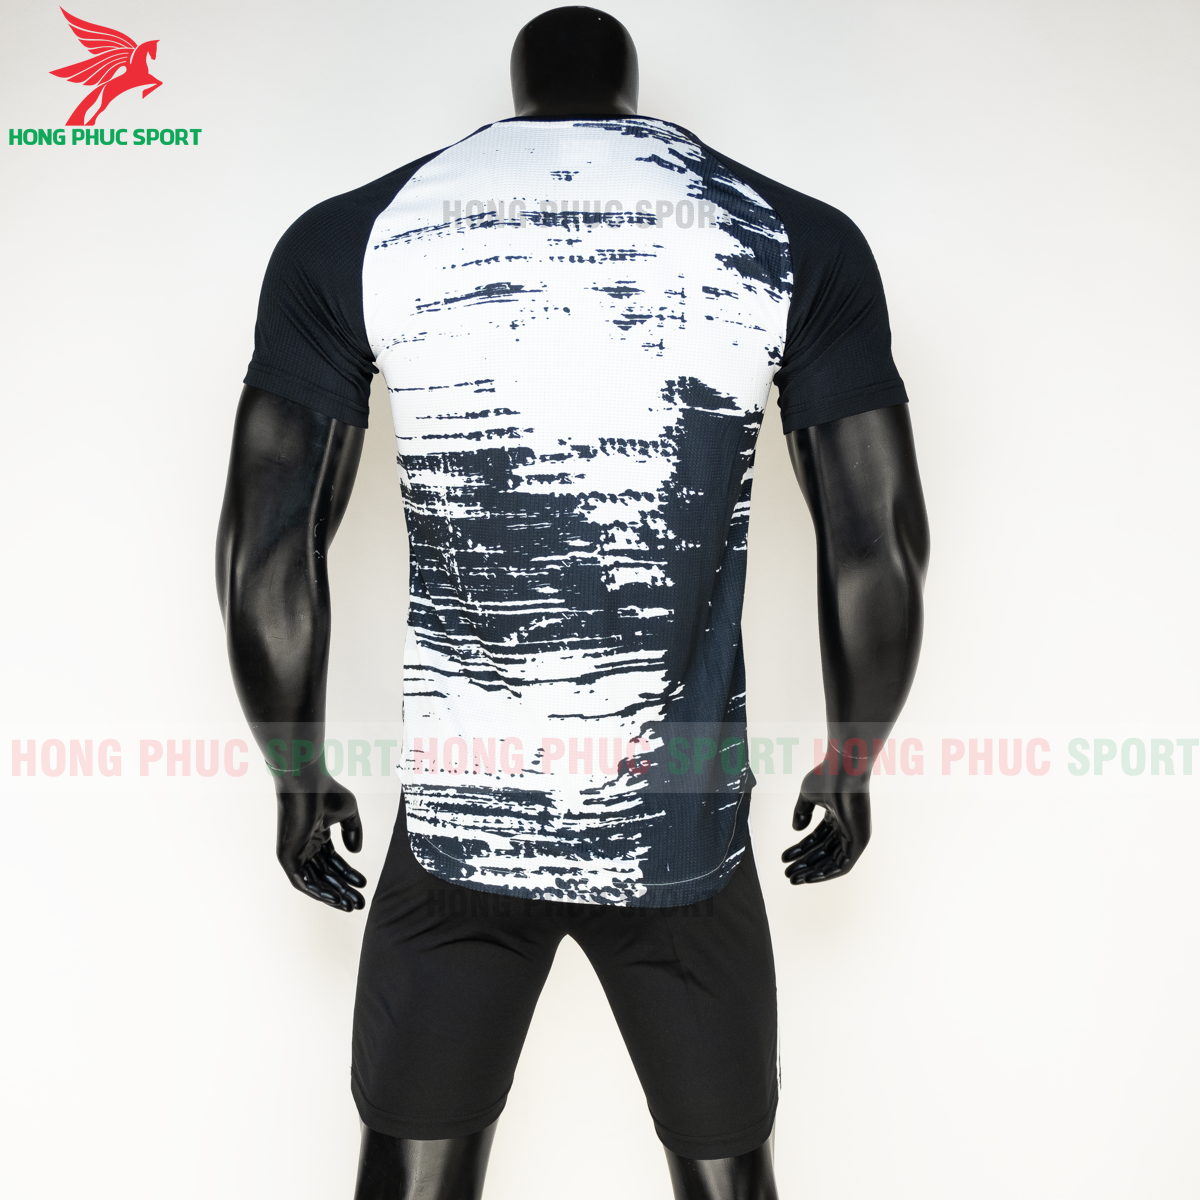 https://cdn.hongphucsport.com/unsafe/s4.shopbay.vn/files/285/ao-bong-da-juventus-20-21-pre-match-hang-thailand-8-5faf4ceb21e13.png